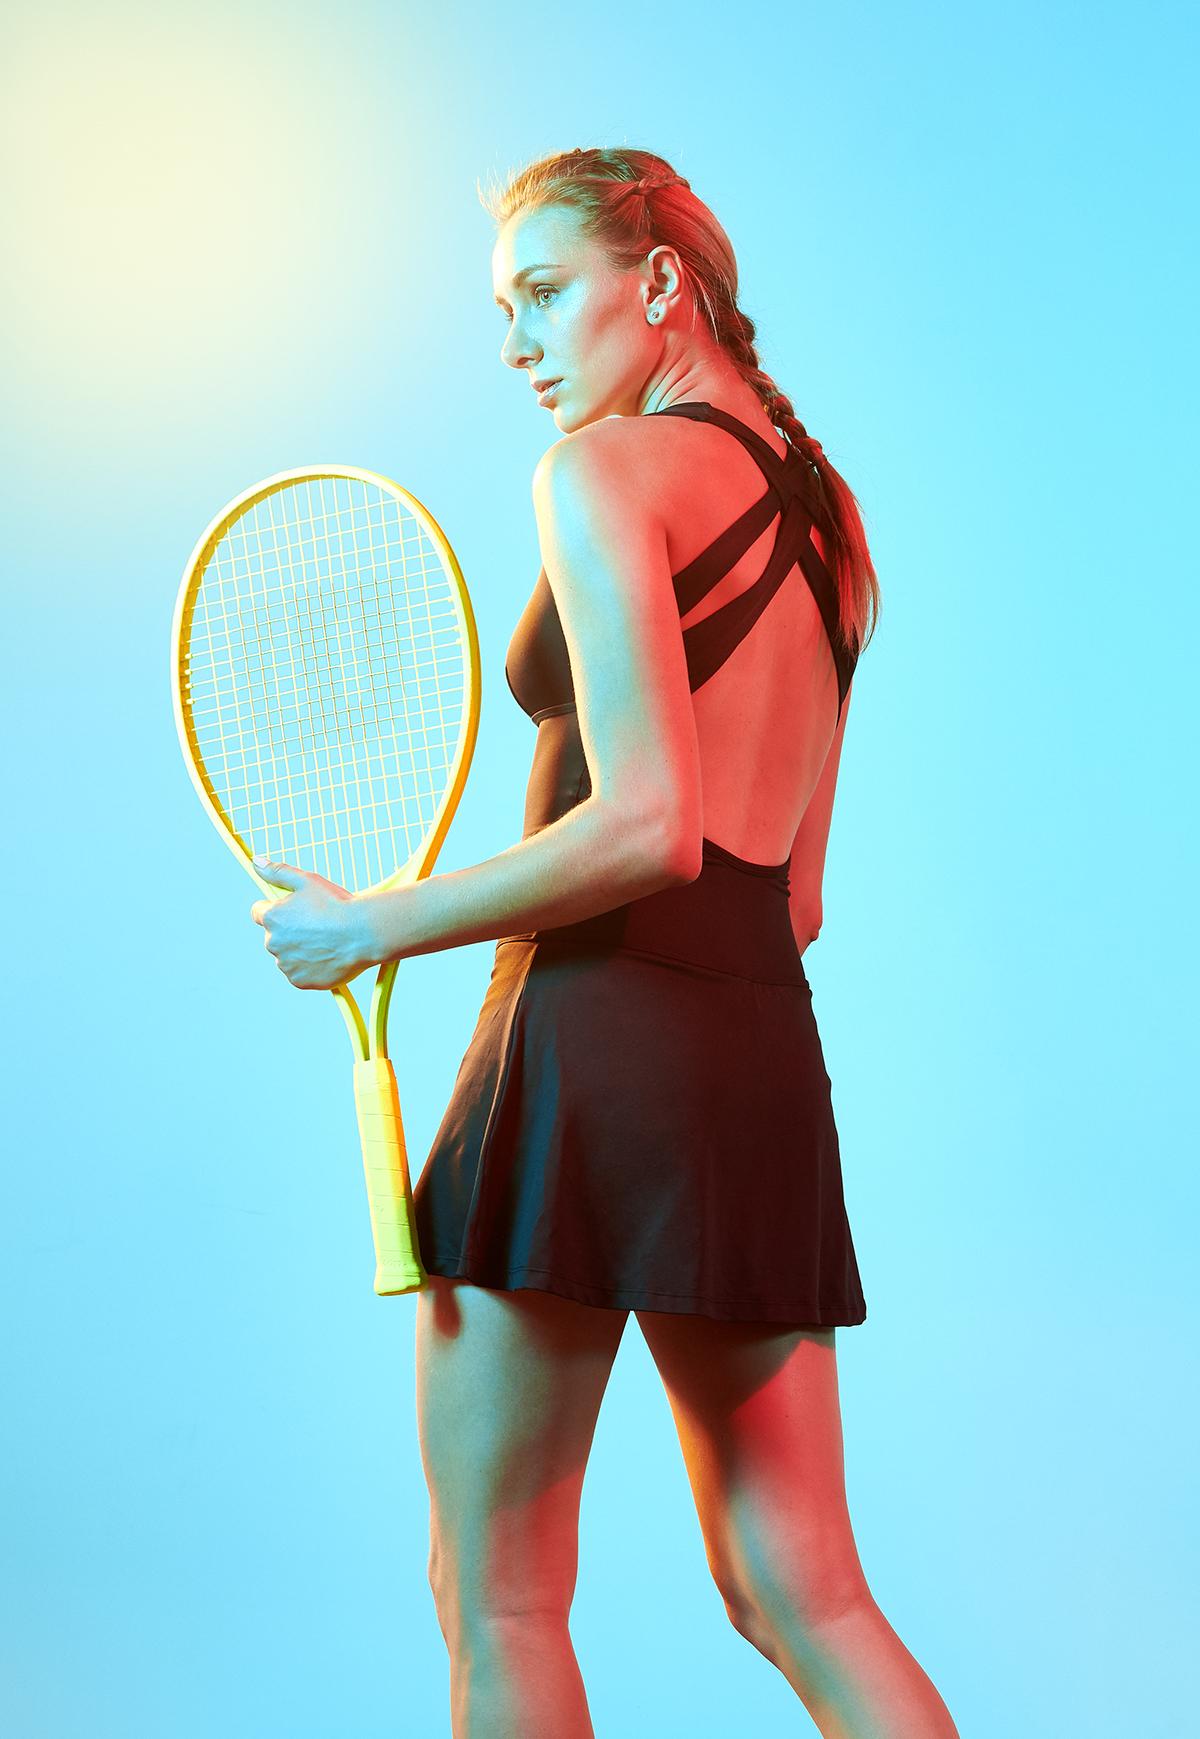 20181111_Tennis11722_FINAL_WEB.jpg